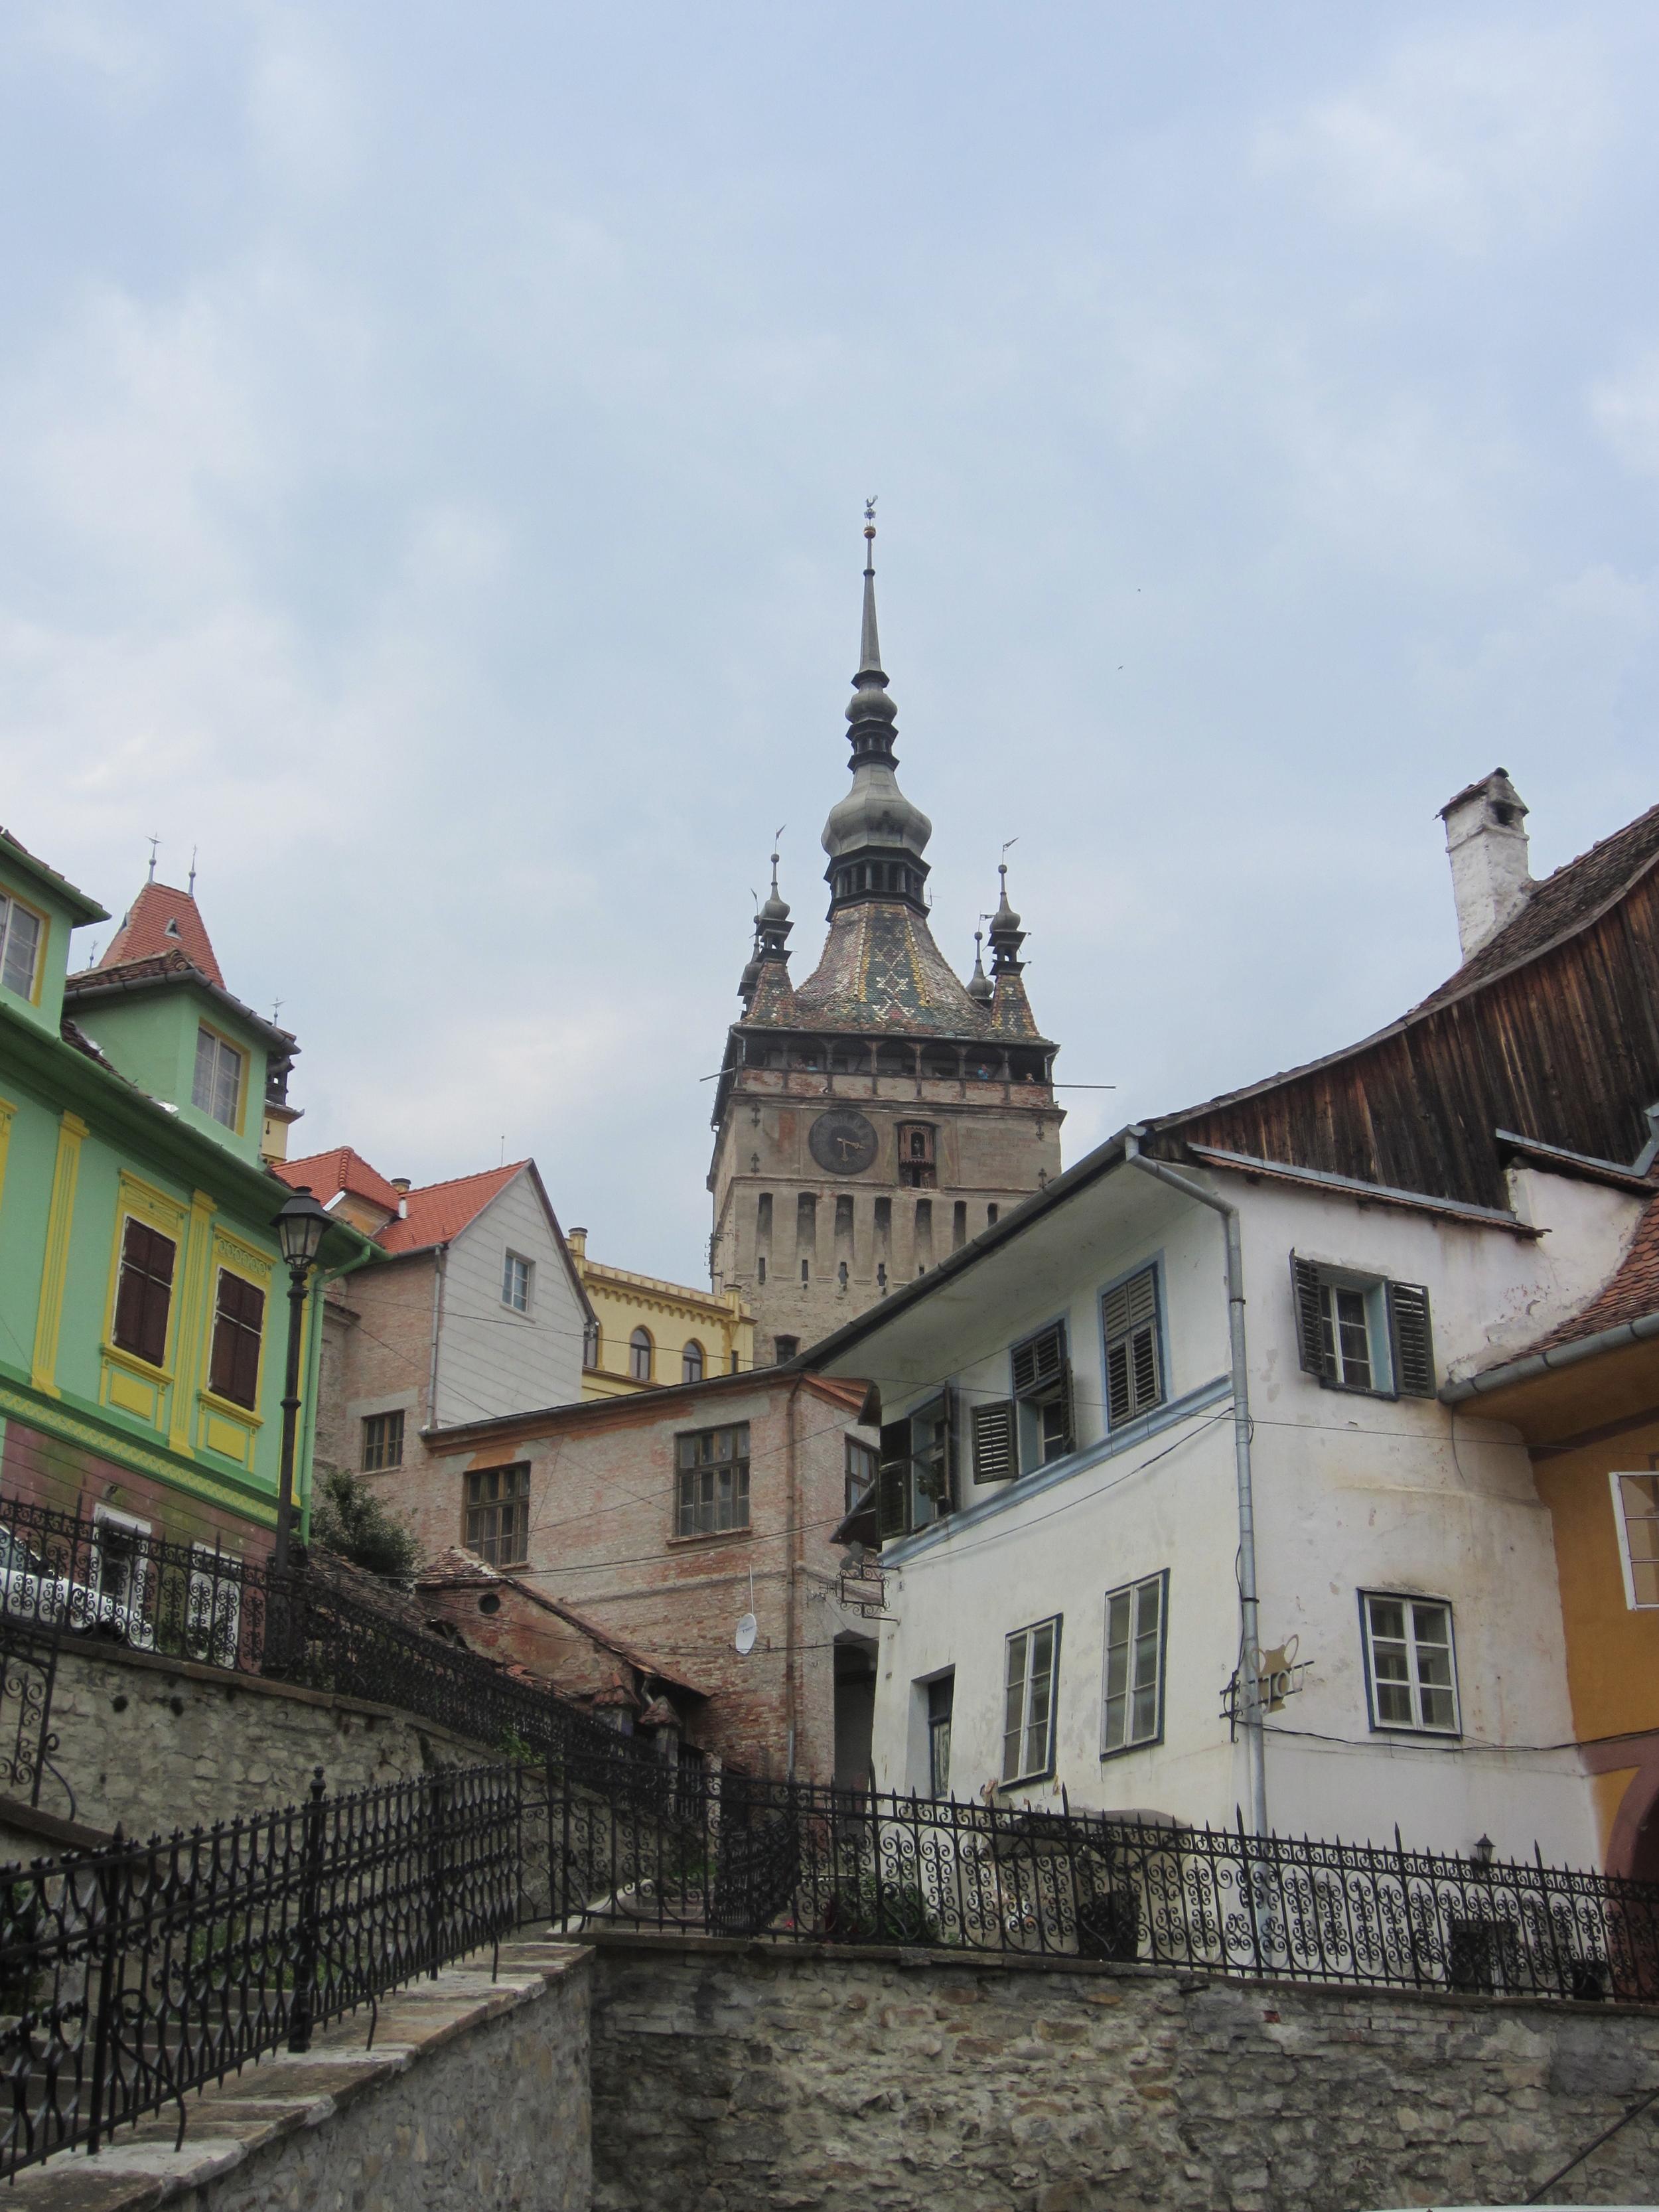 Looking up at Dracula's birthplace